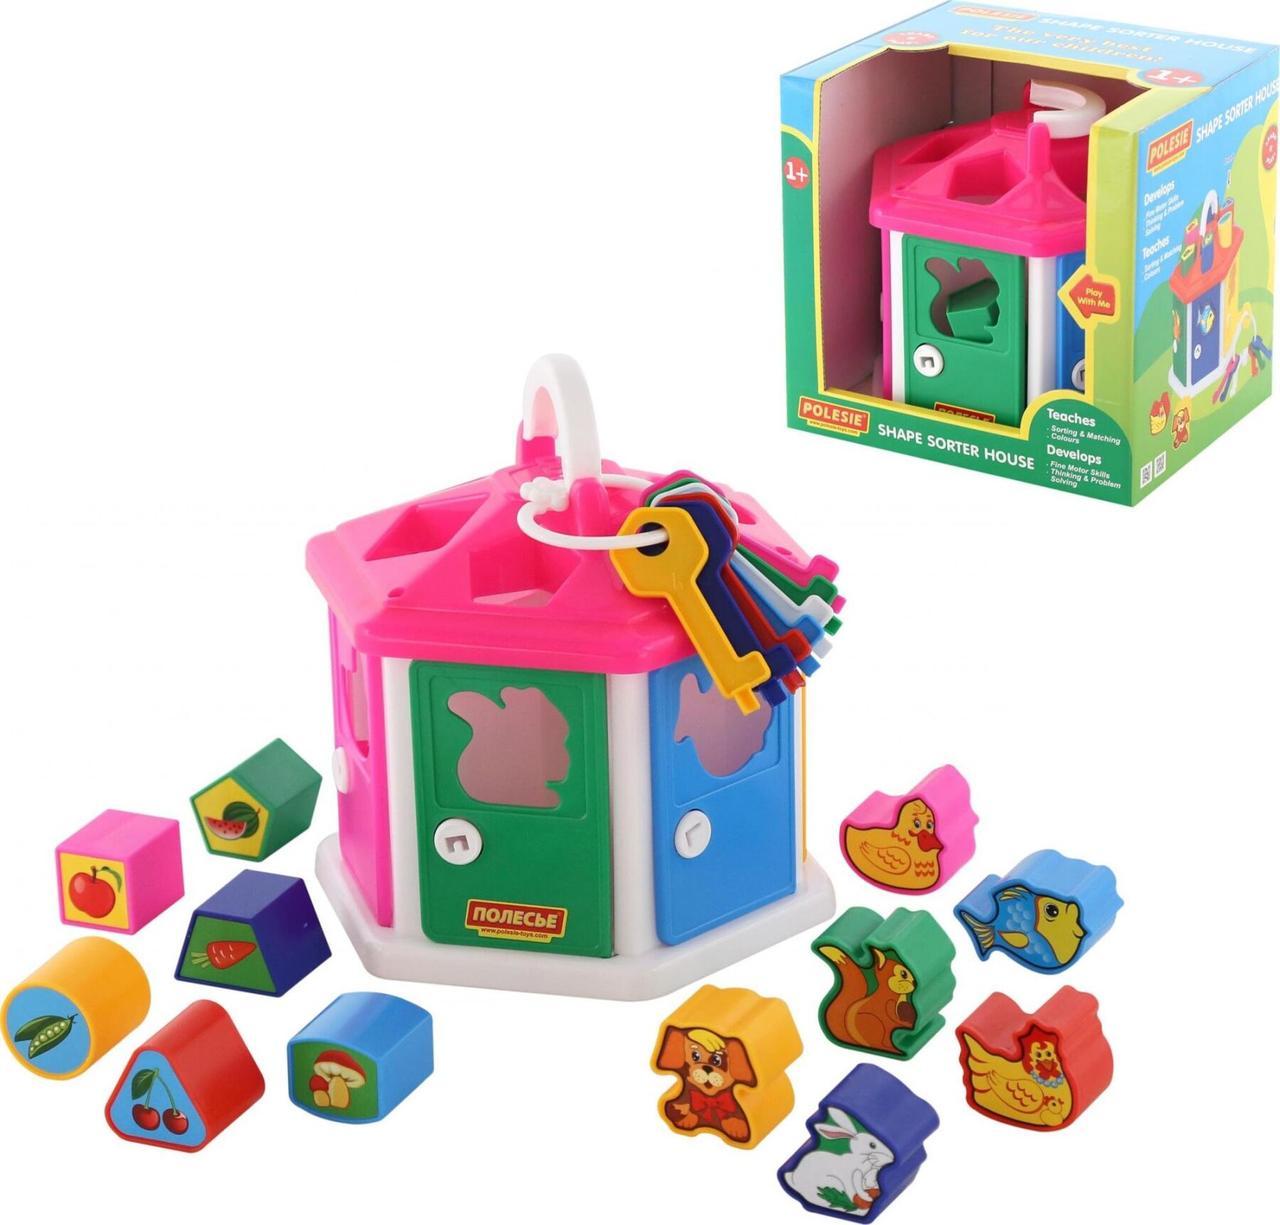 Игра Polesie логический домик в коробке (6011)